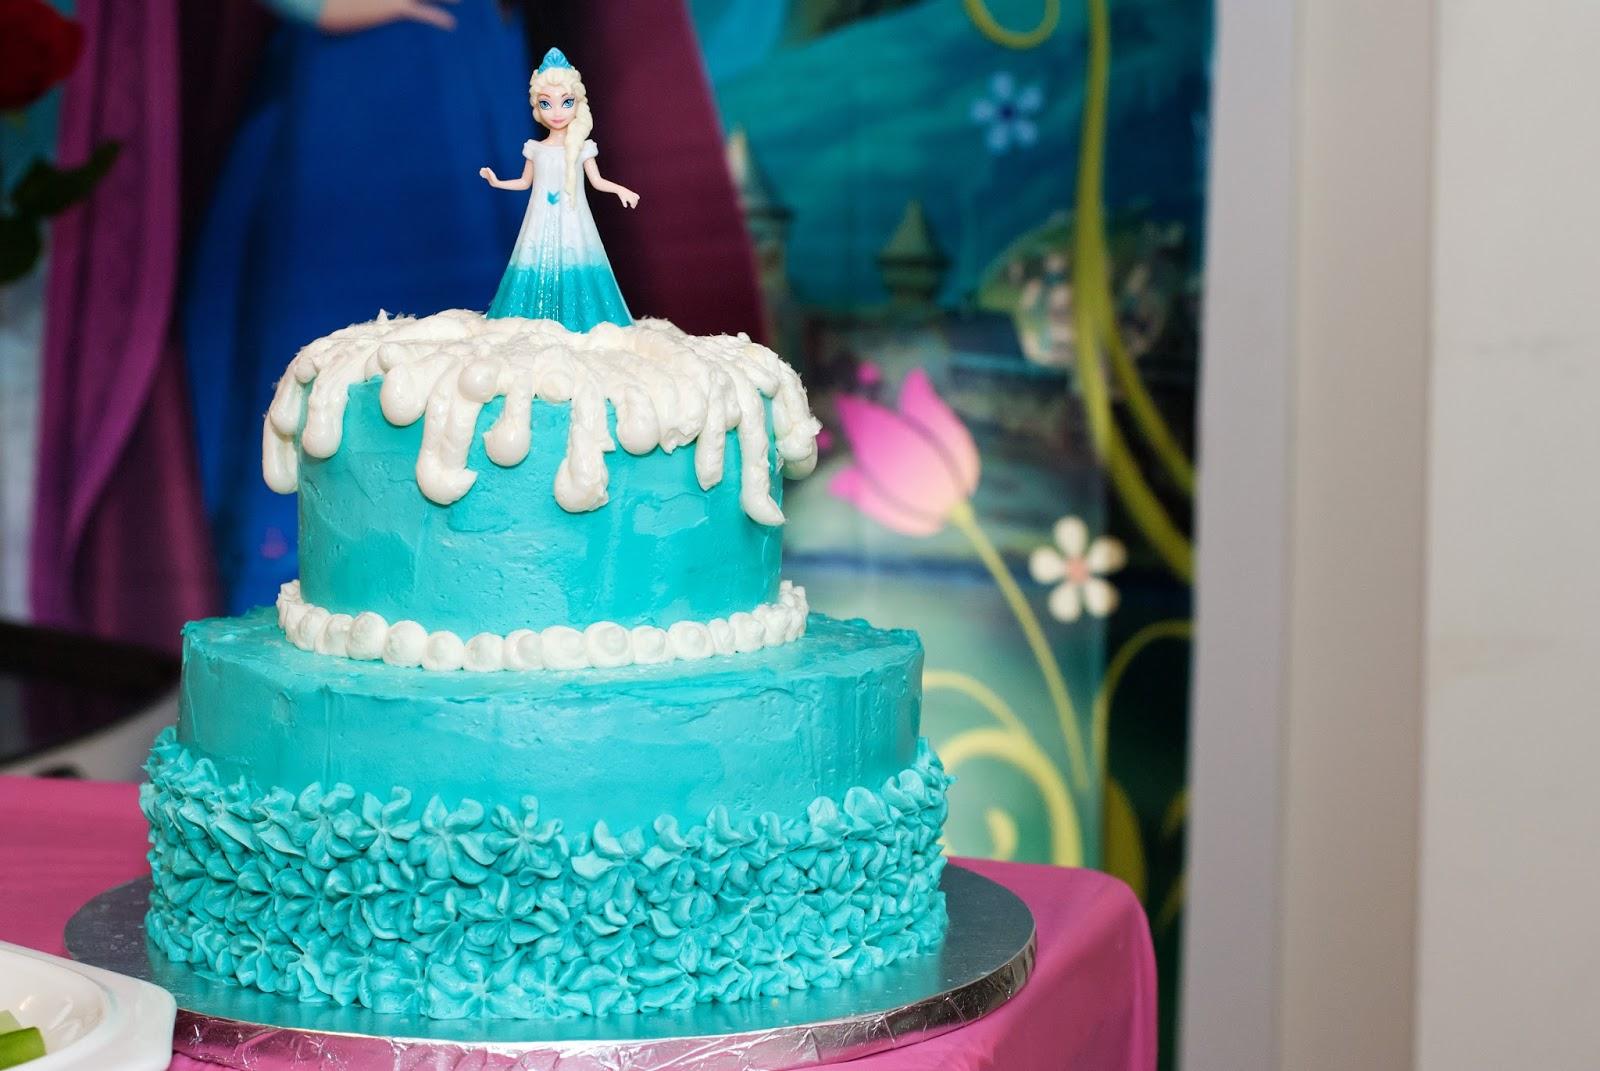 Ali la mode Frozen Princess Elsa Layer Cake Vanilla Sponge Cake